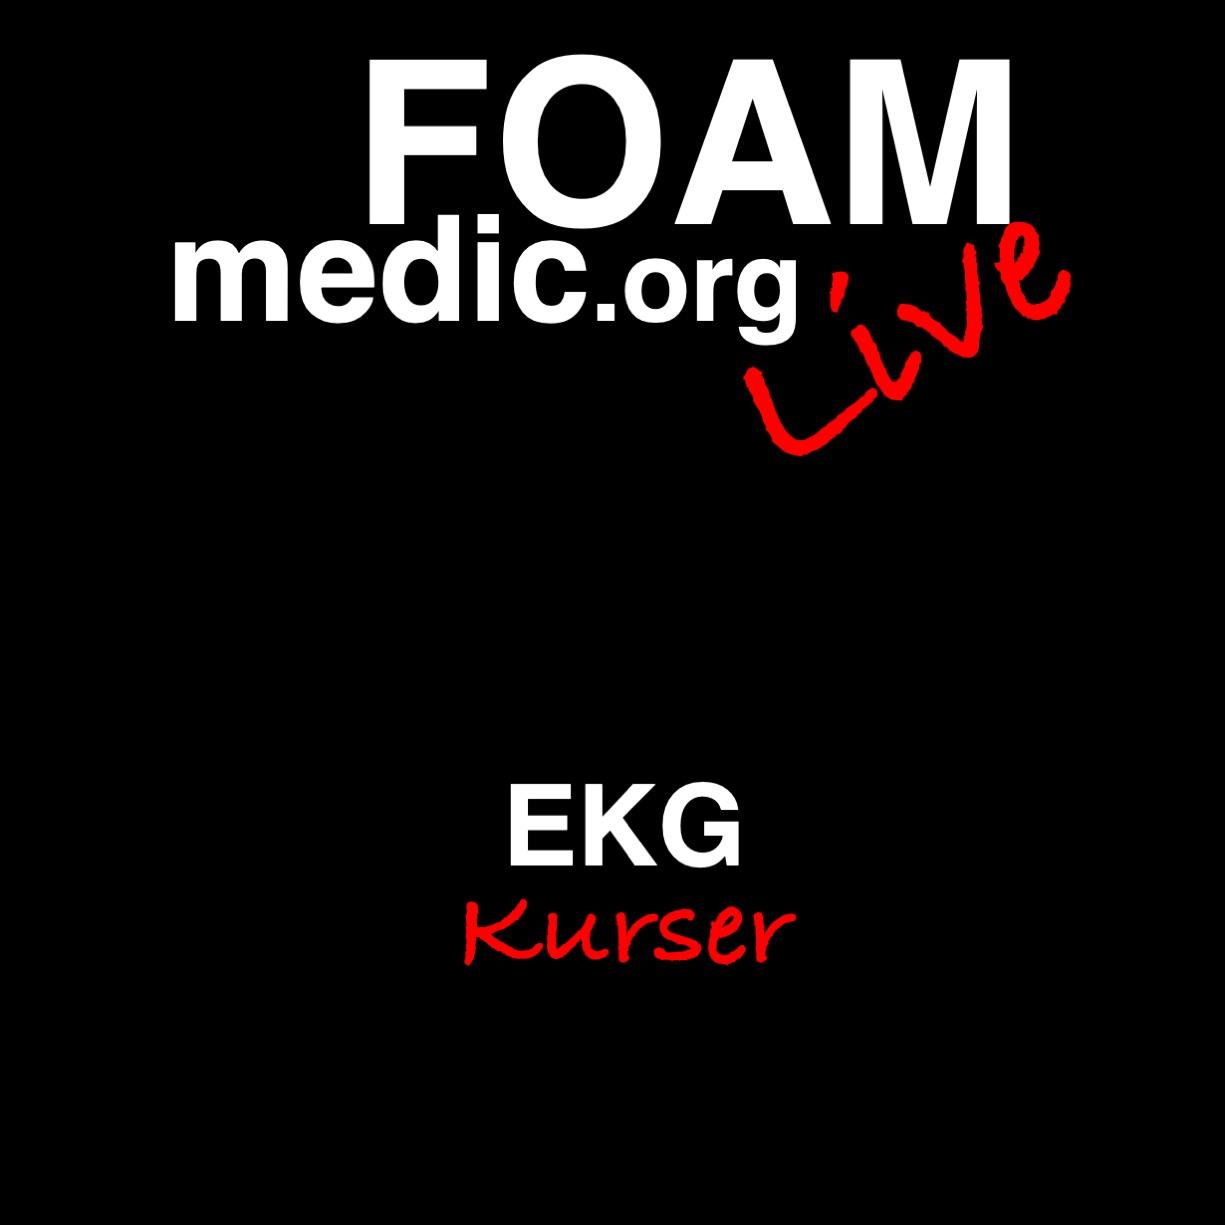 EKG kurser